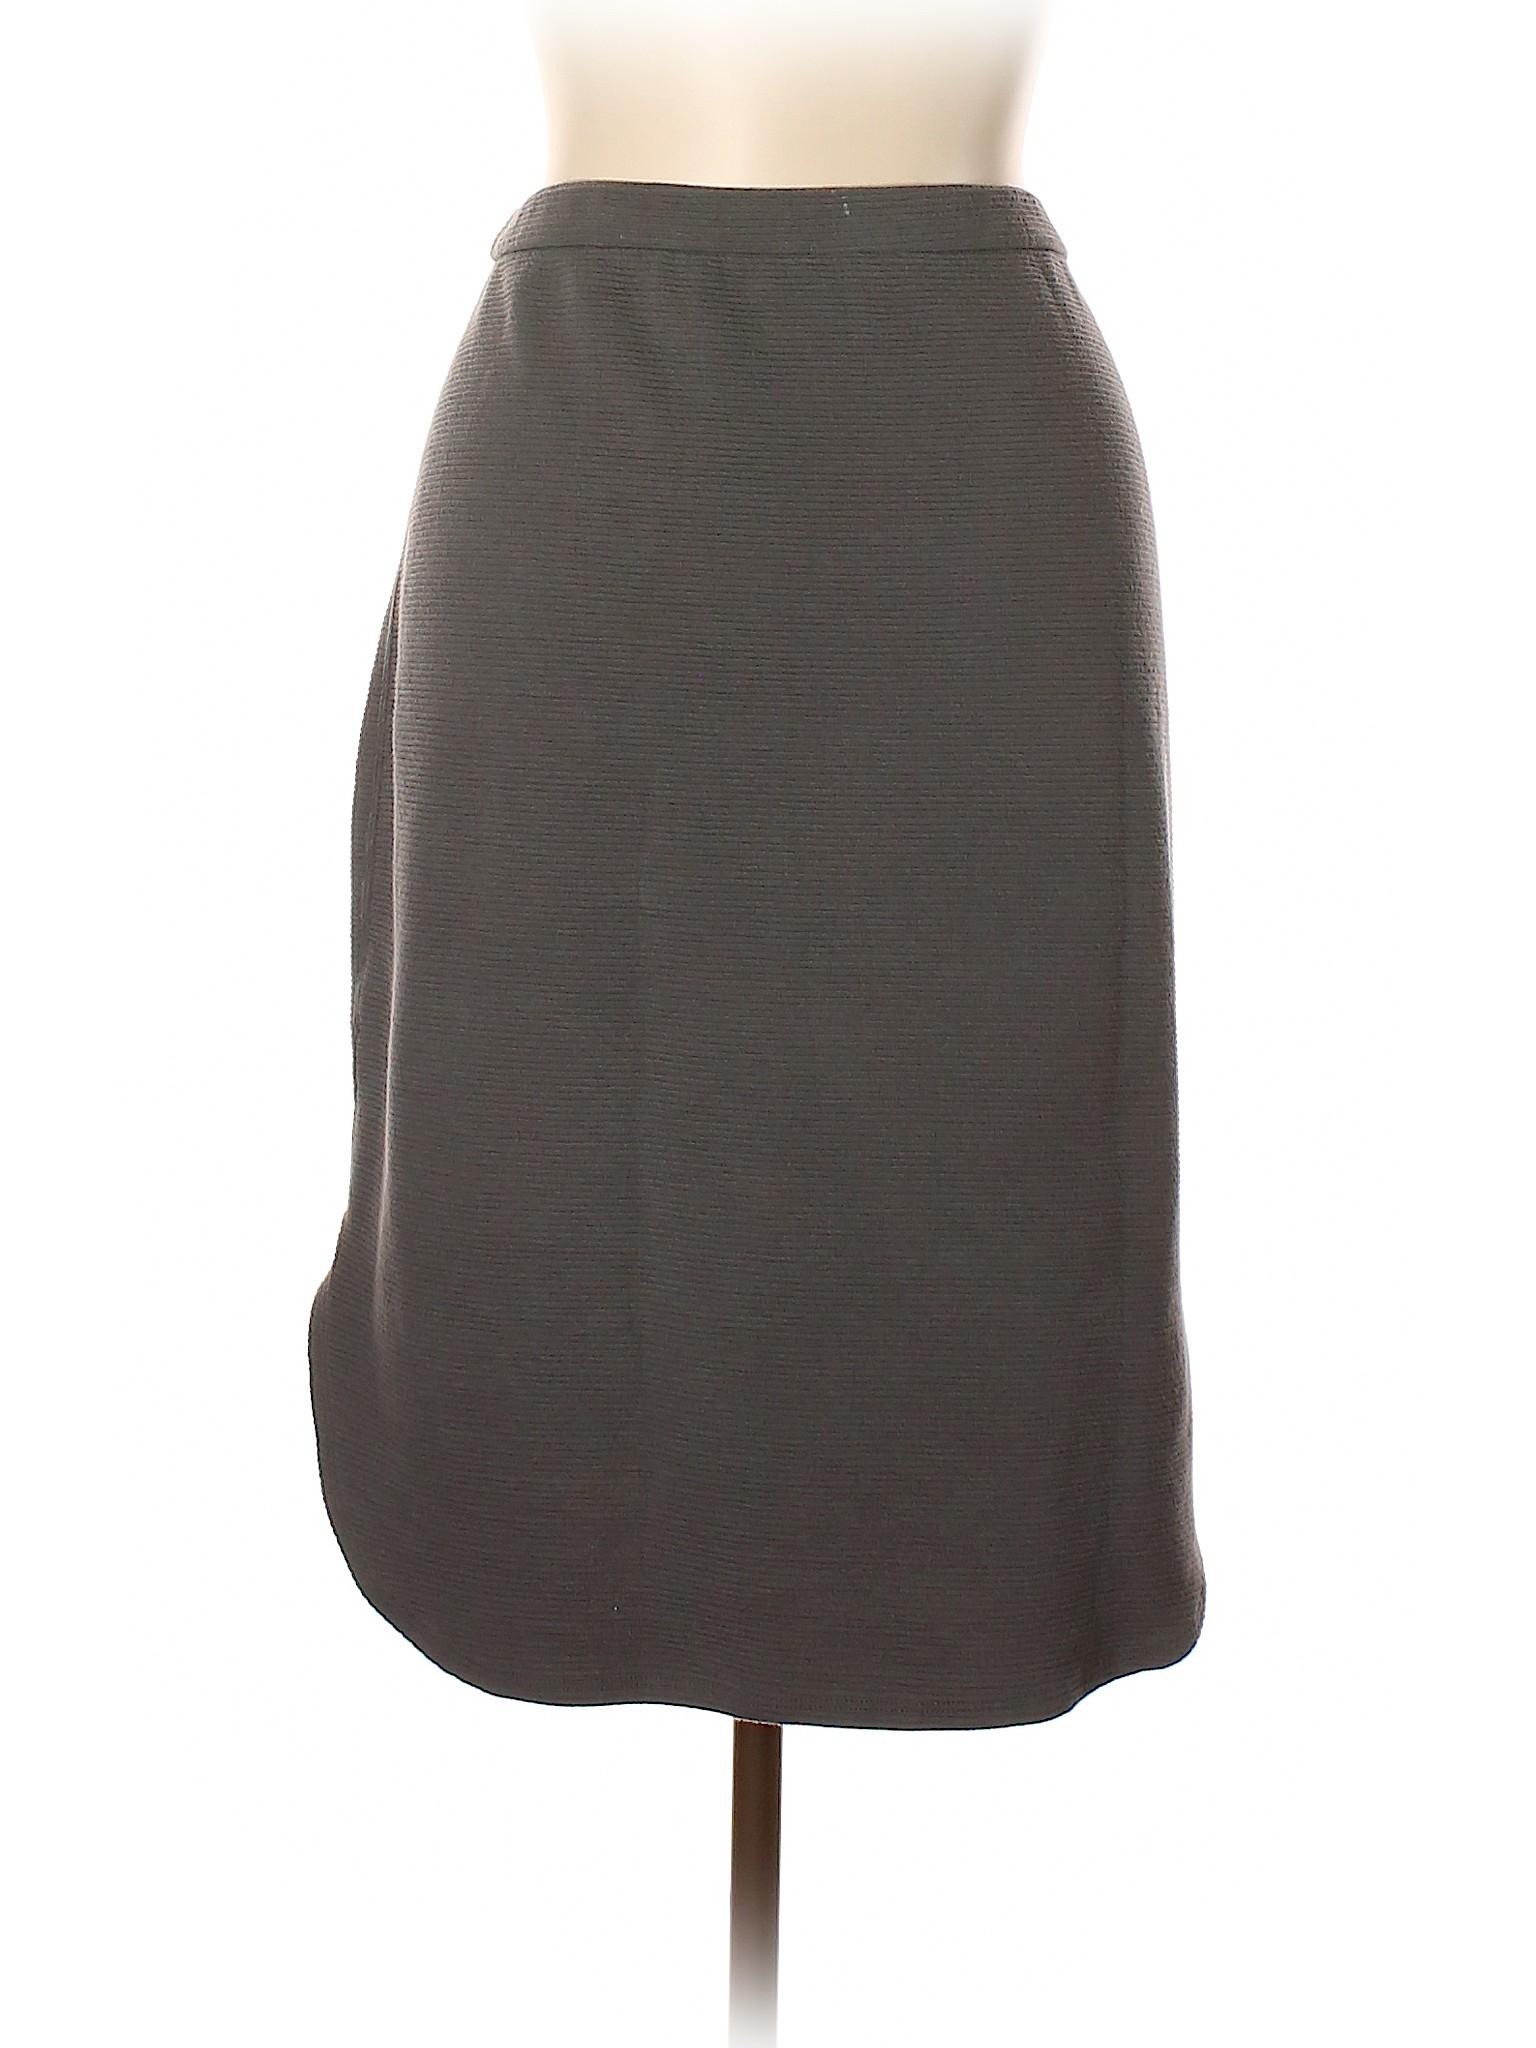 Boutique Boutique Republic Casual Banana Banana Republic Skirt Casual ZZpRq8w